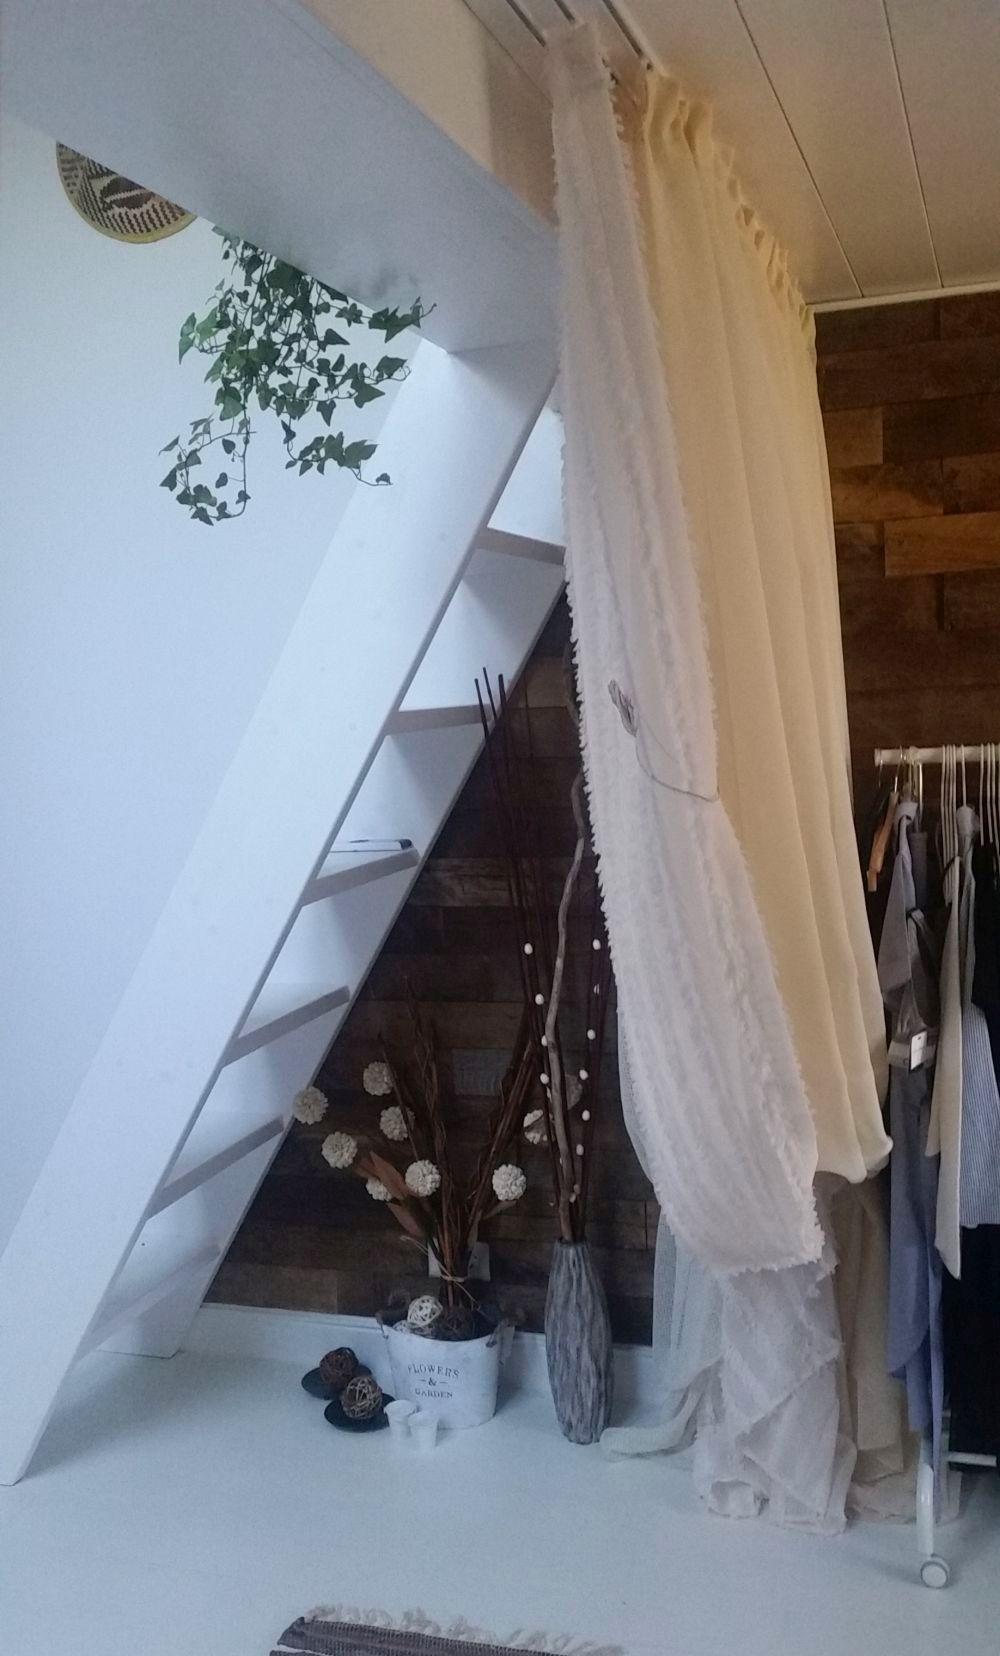 adelaparvu.com despre amenajare camera adolescenta Bucuresti, Romania, stil BoHo chic, Designer Adela Parvu, Foto Adela Parvu (25)